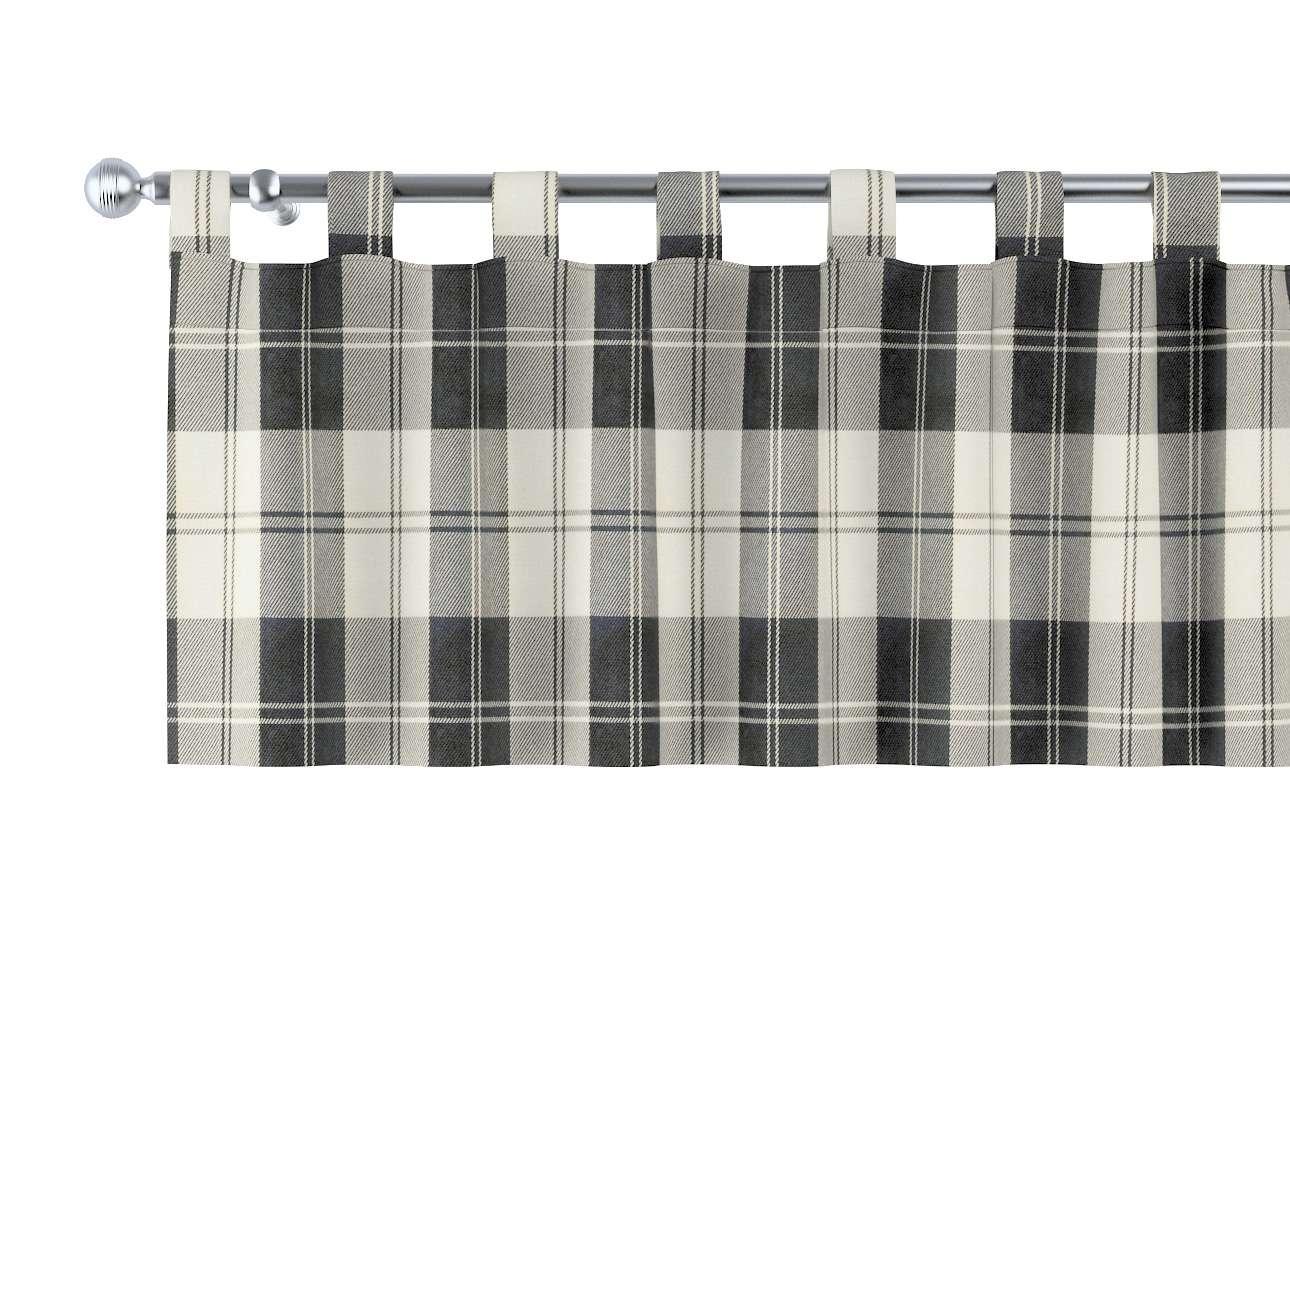 Lambrekin na szelkach 130x40cm w kolekcji Edinburgh, tkanina: 115-74